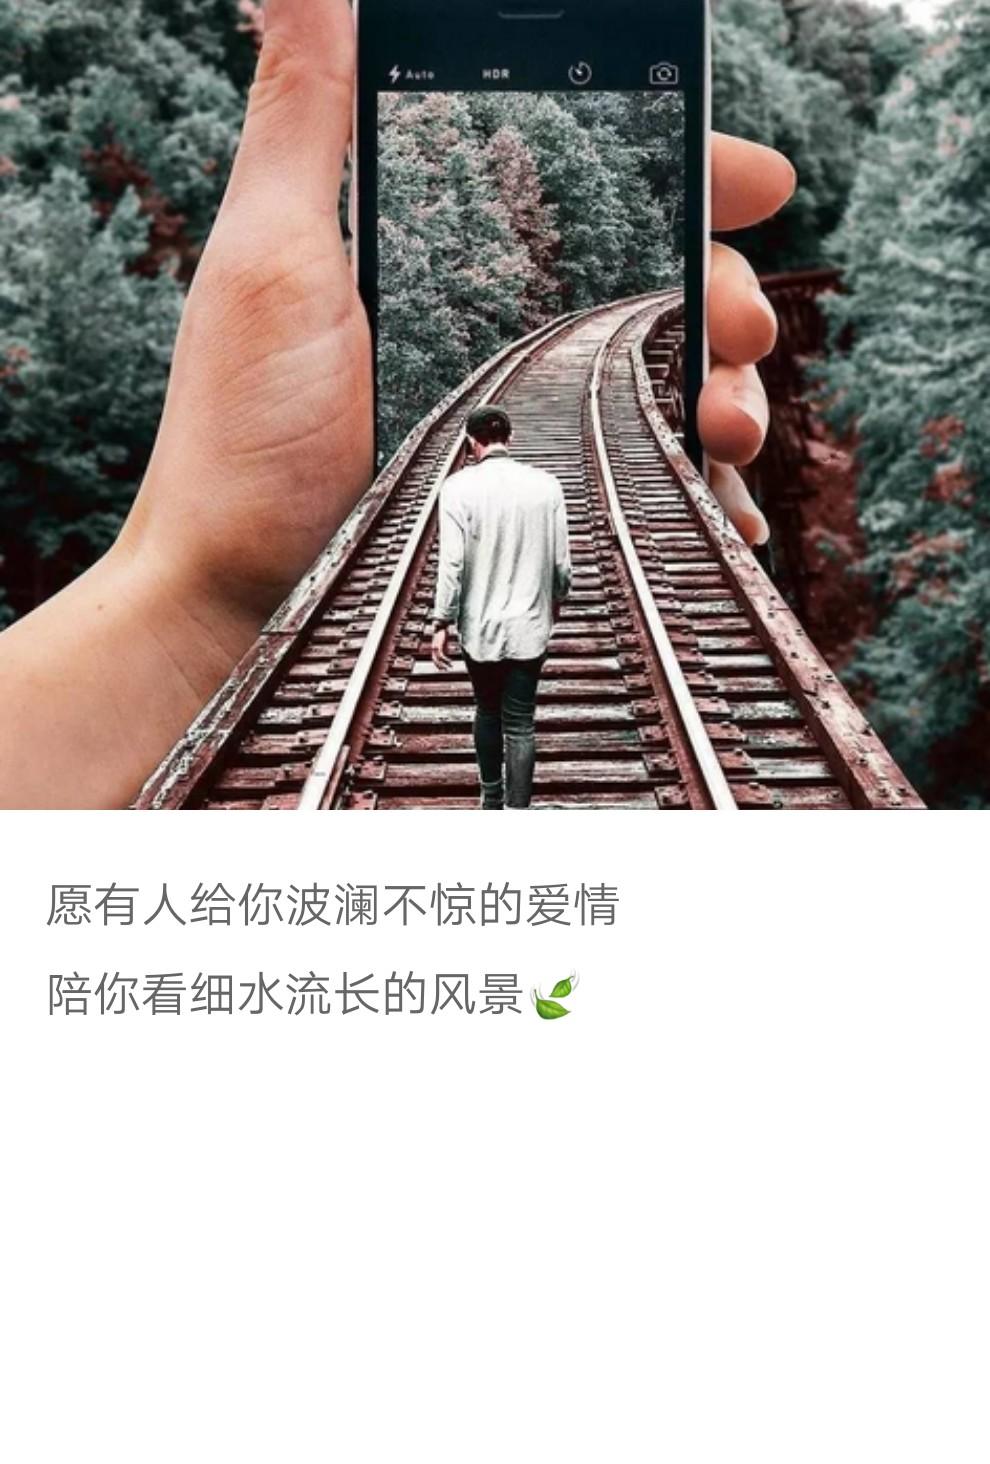 http://www.58100.com/pid/623596.html